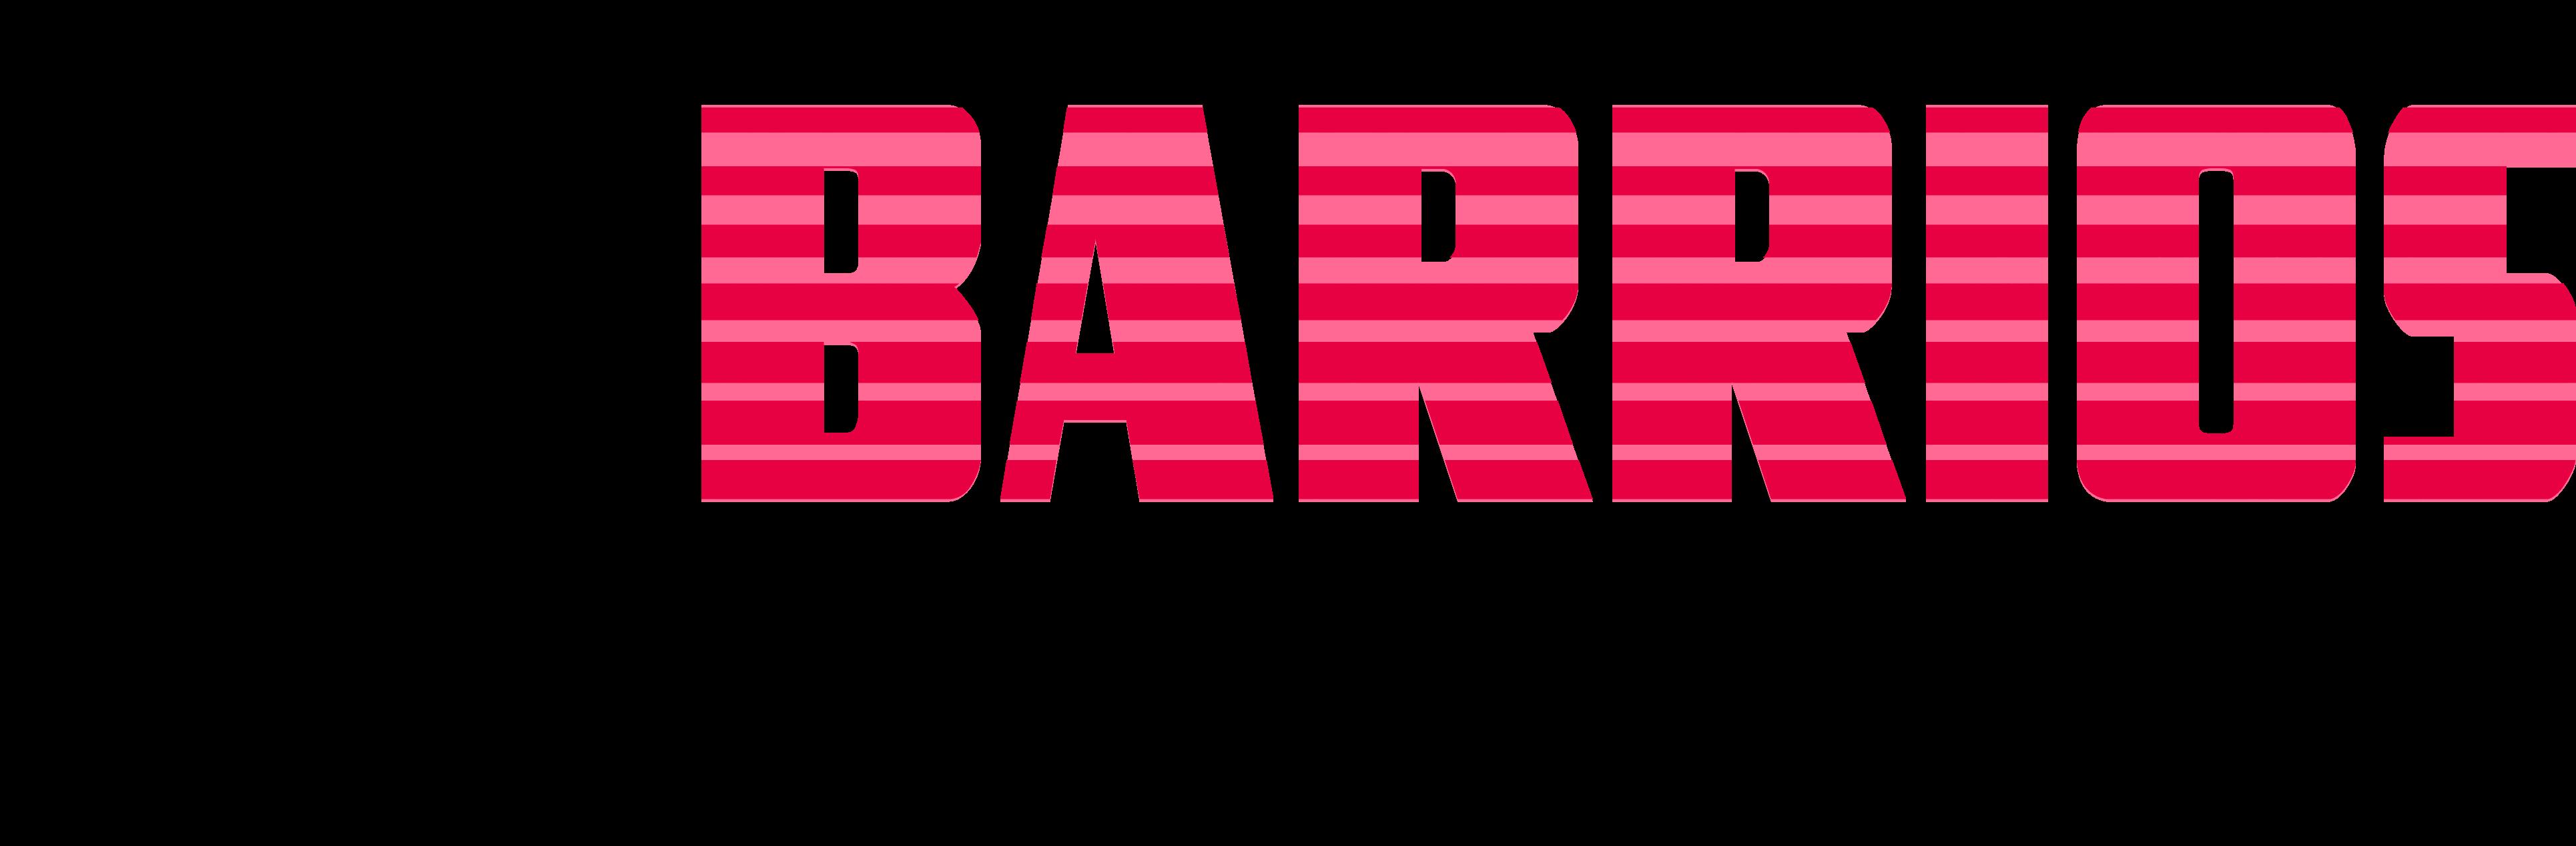 DJBarrios